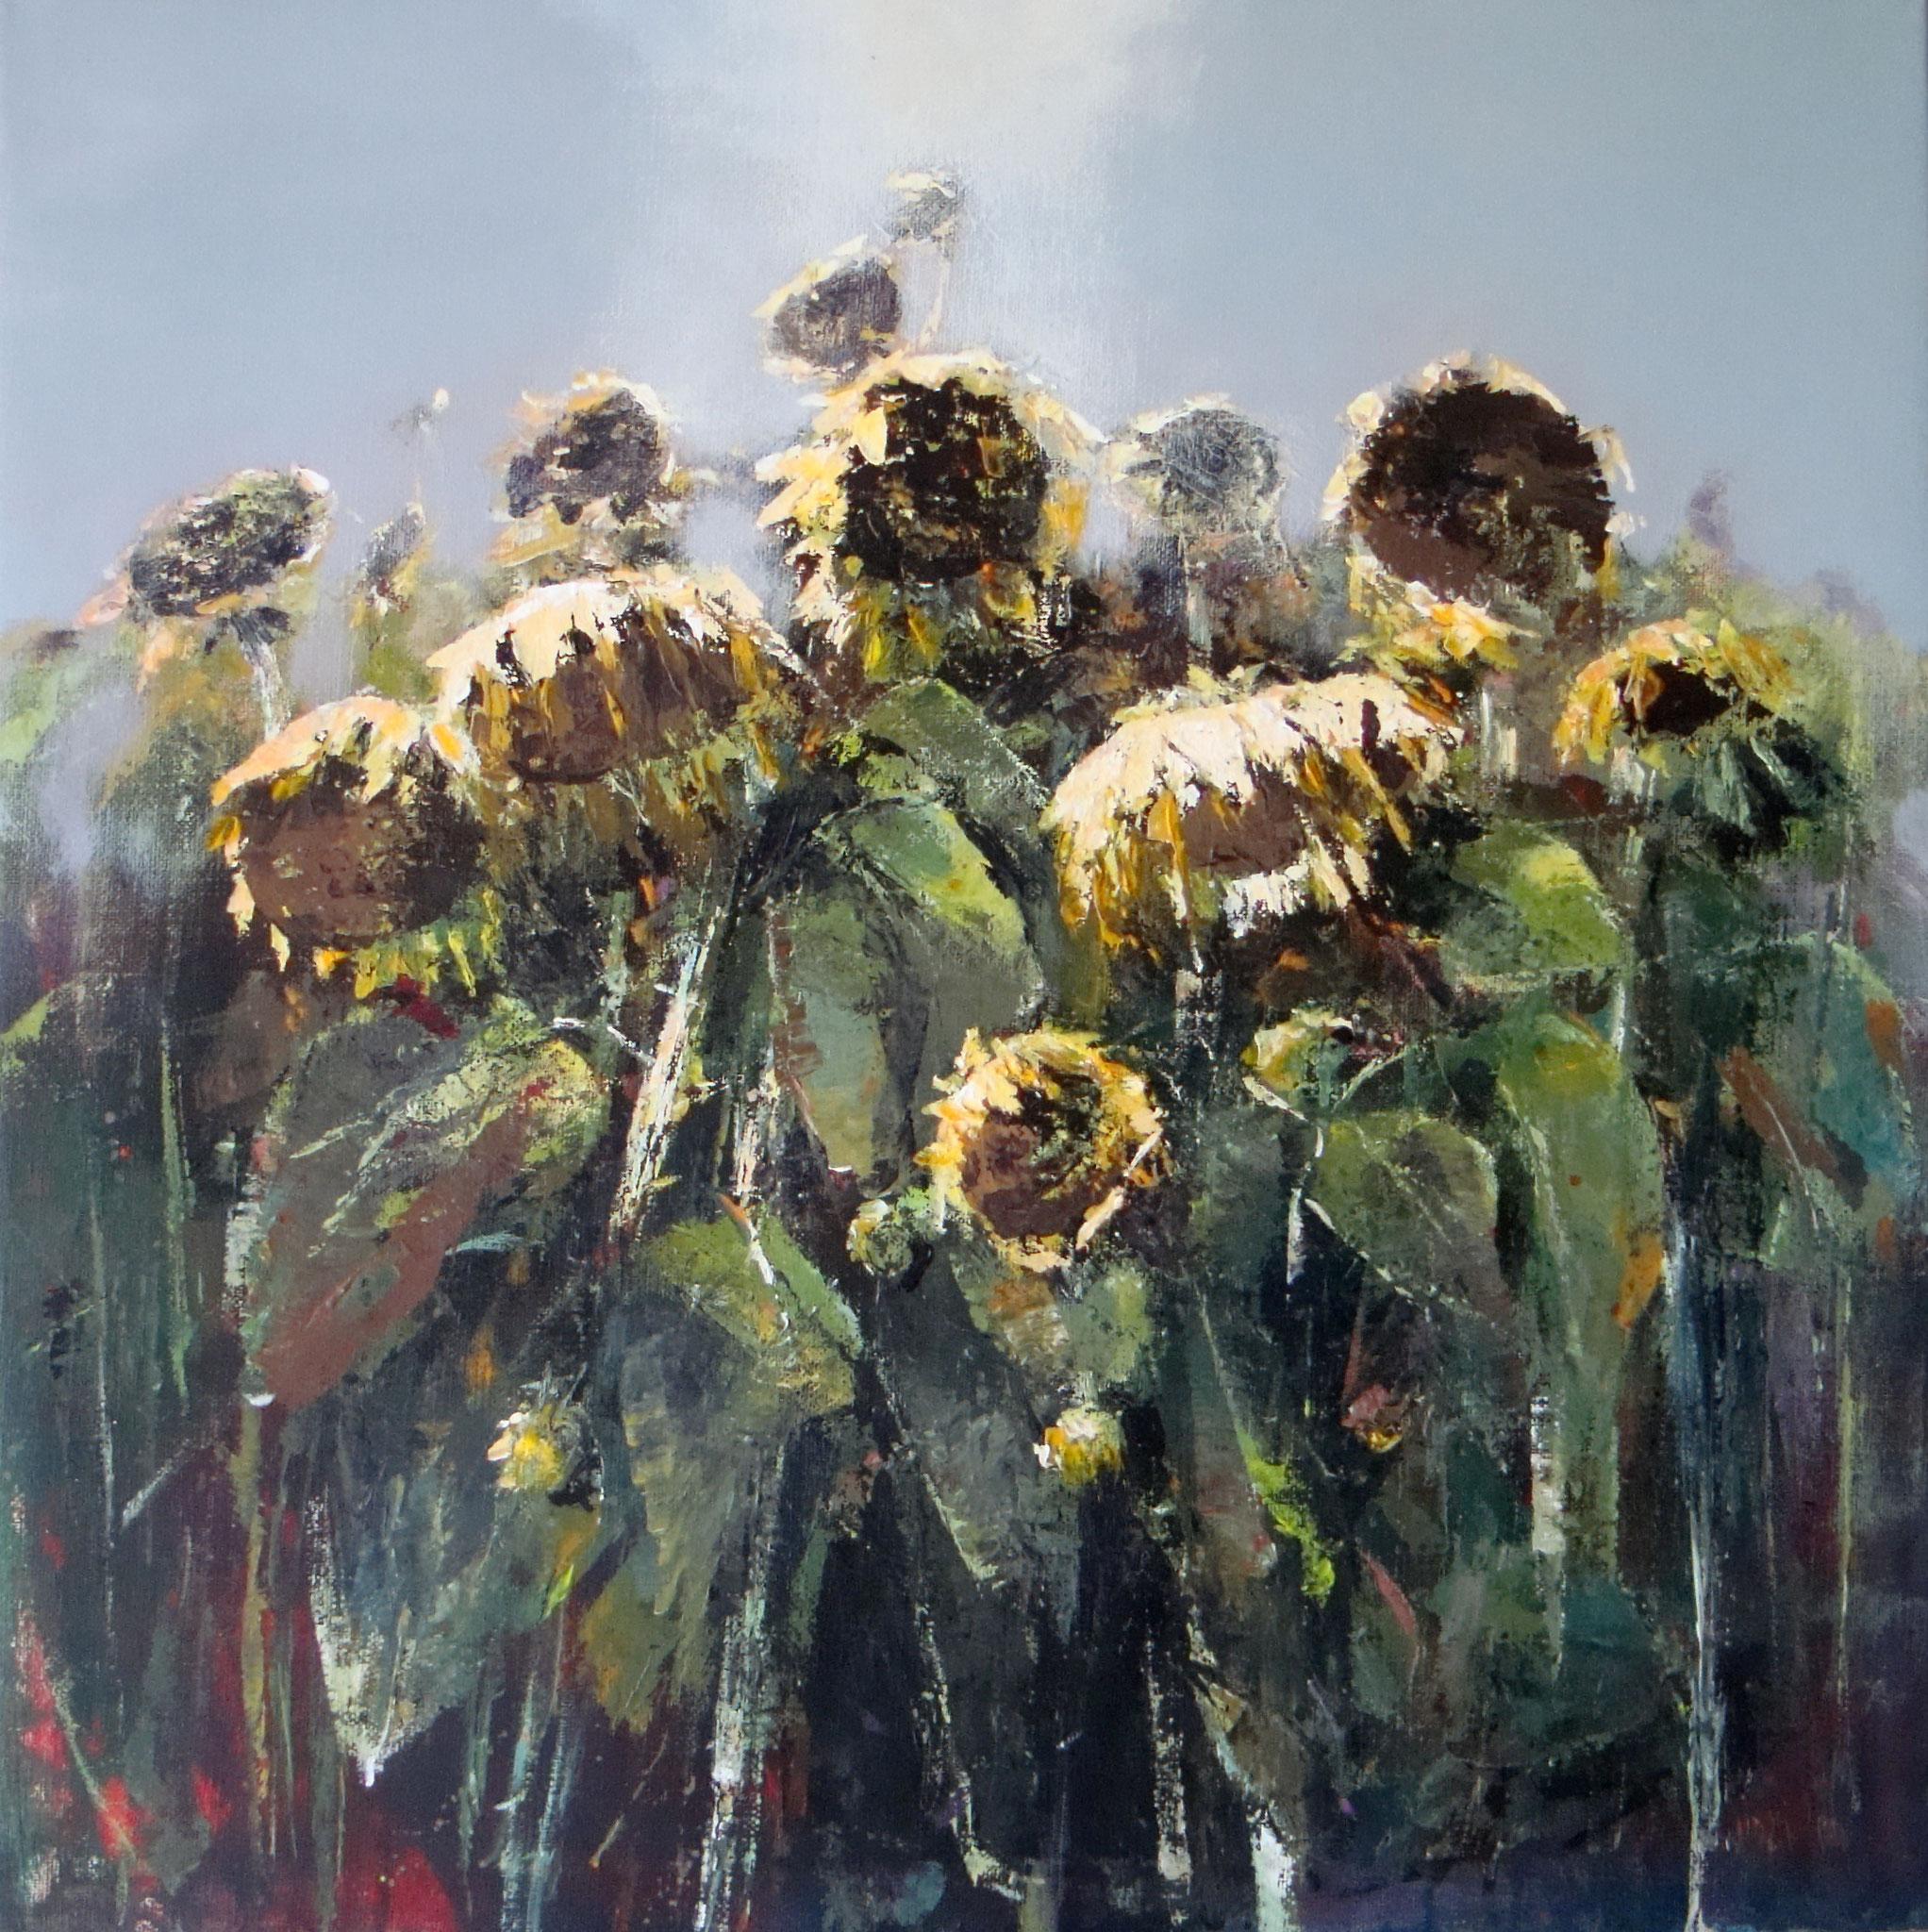 """I giganti L'ultimo canto dell'estate"" ´- Öl  auf Leinwand 80x80 cm"